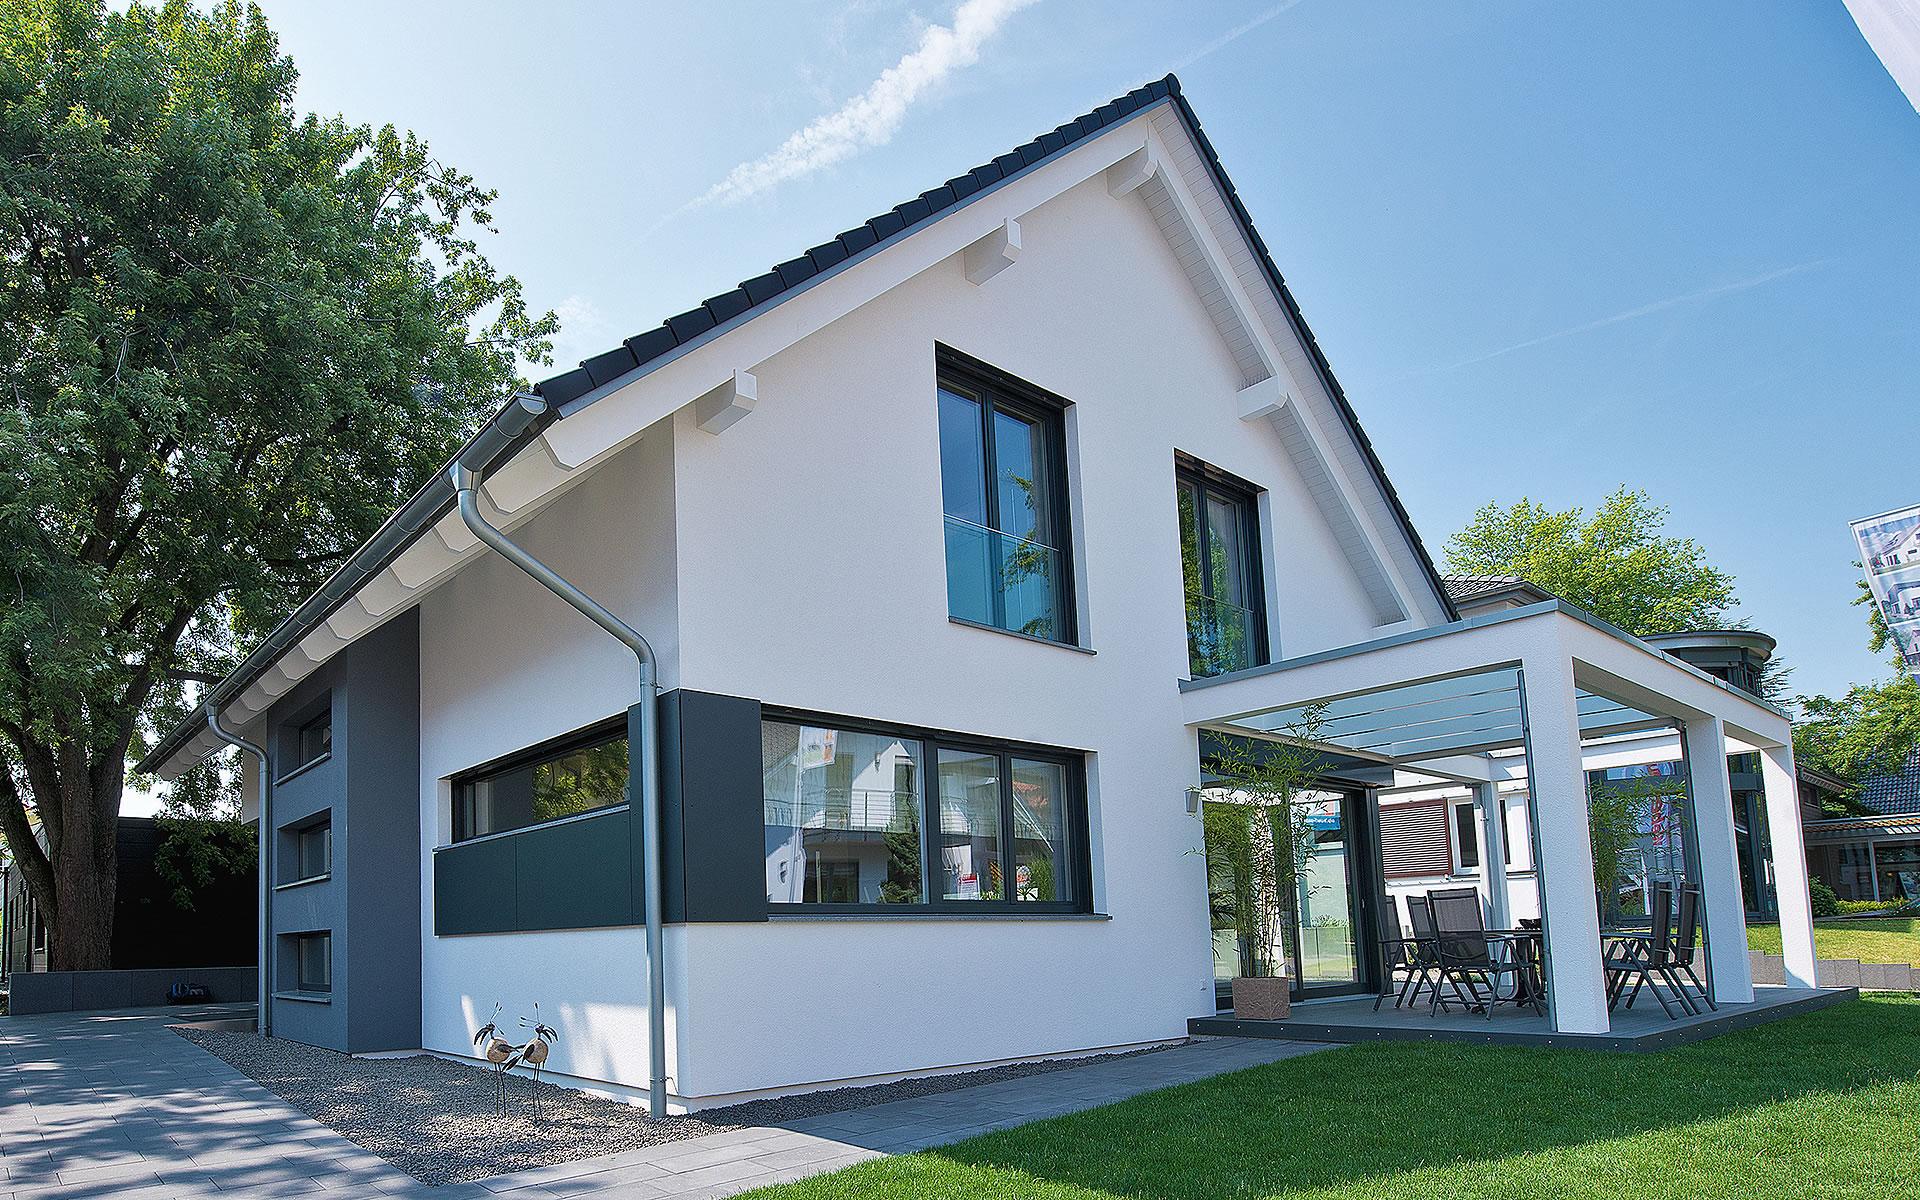 Musterhaus Fellbach (generation 5.5) von WeberHaus GmbH & Co. KG